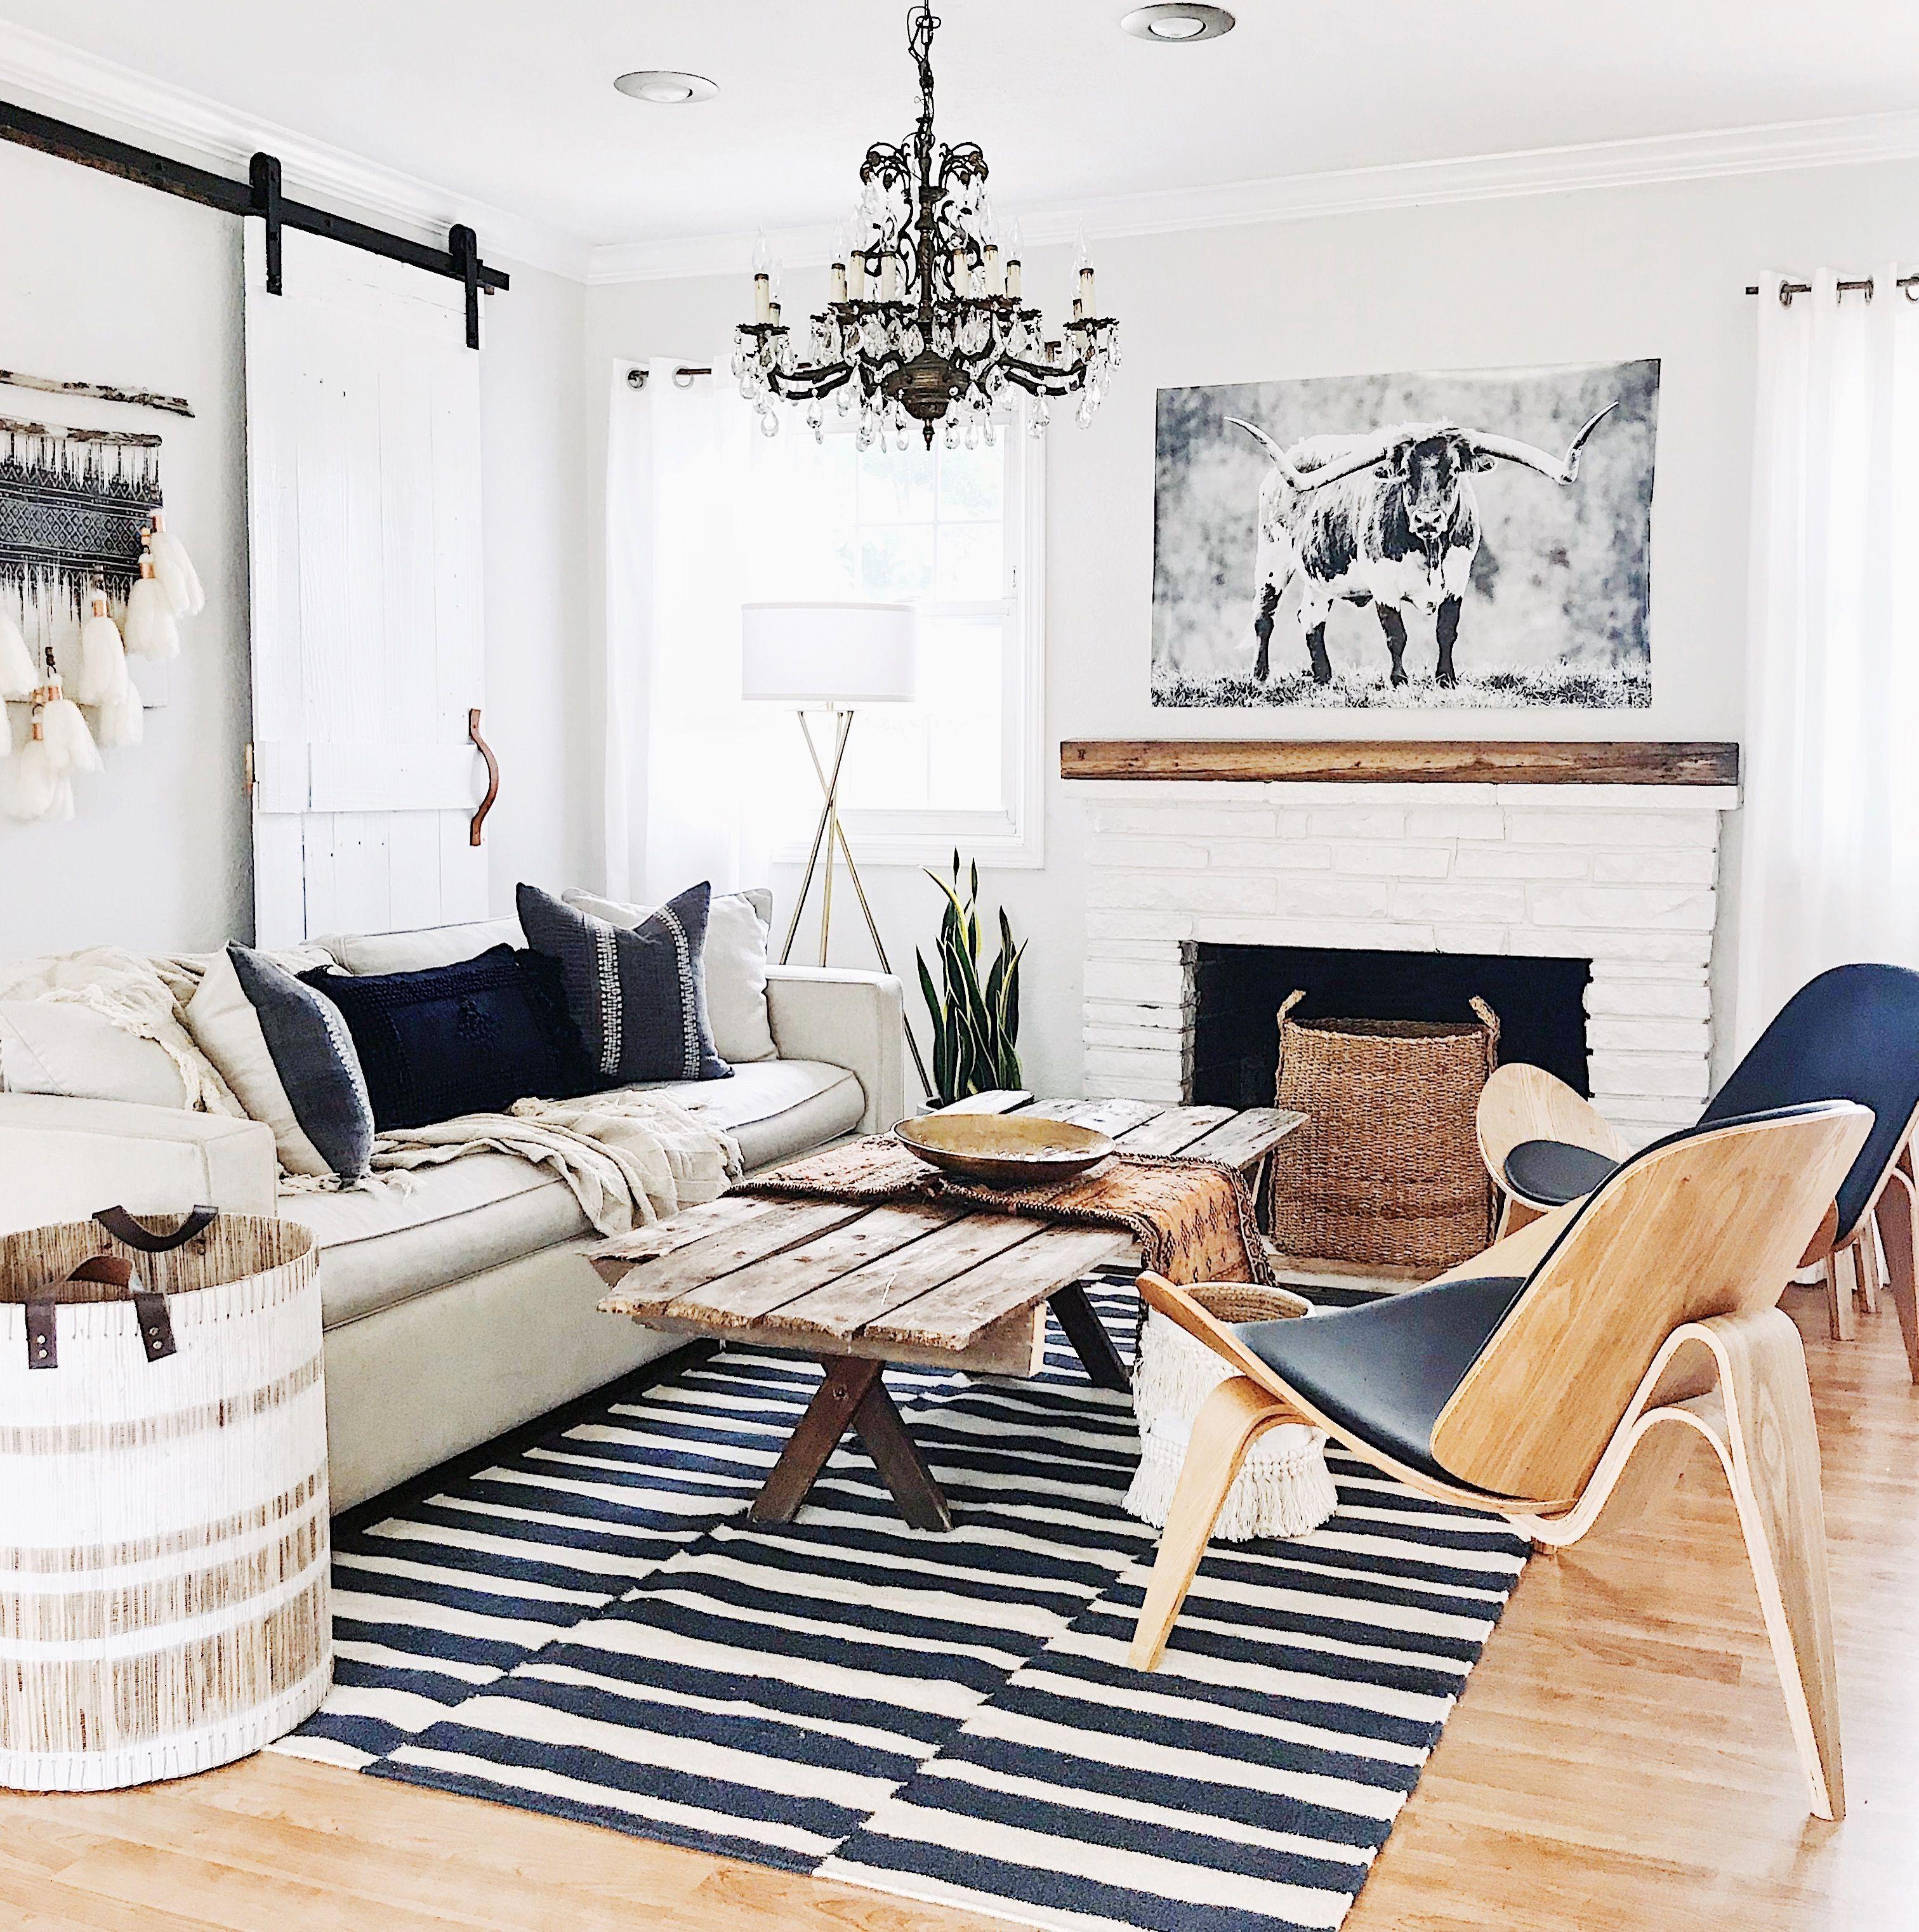 52 Stunning Mix Farmhouse Scandinavian Style For Interior De